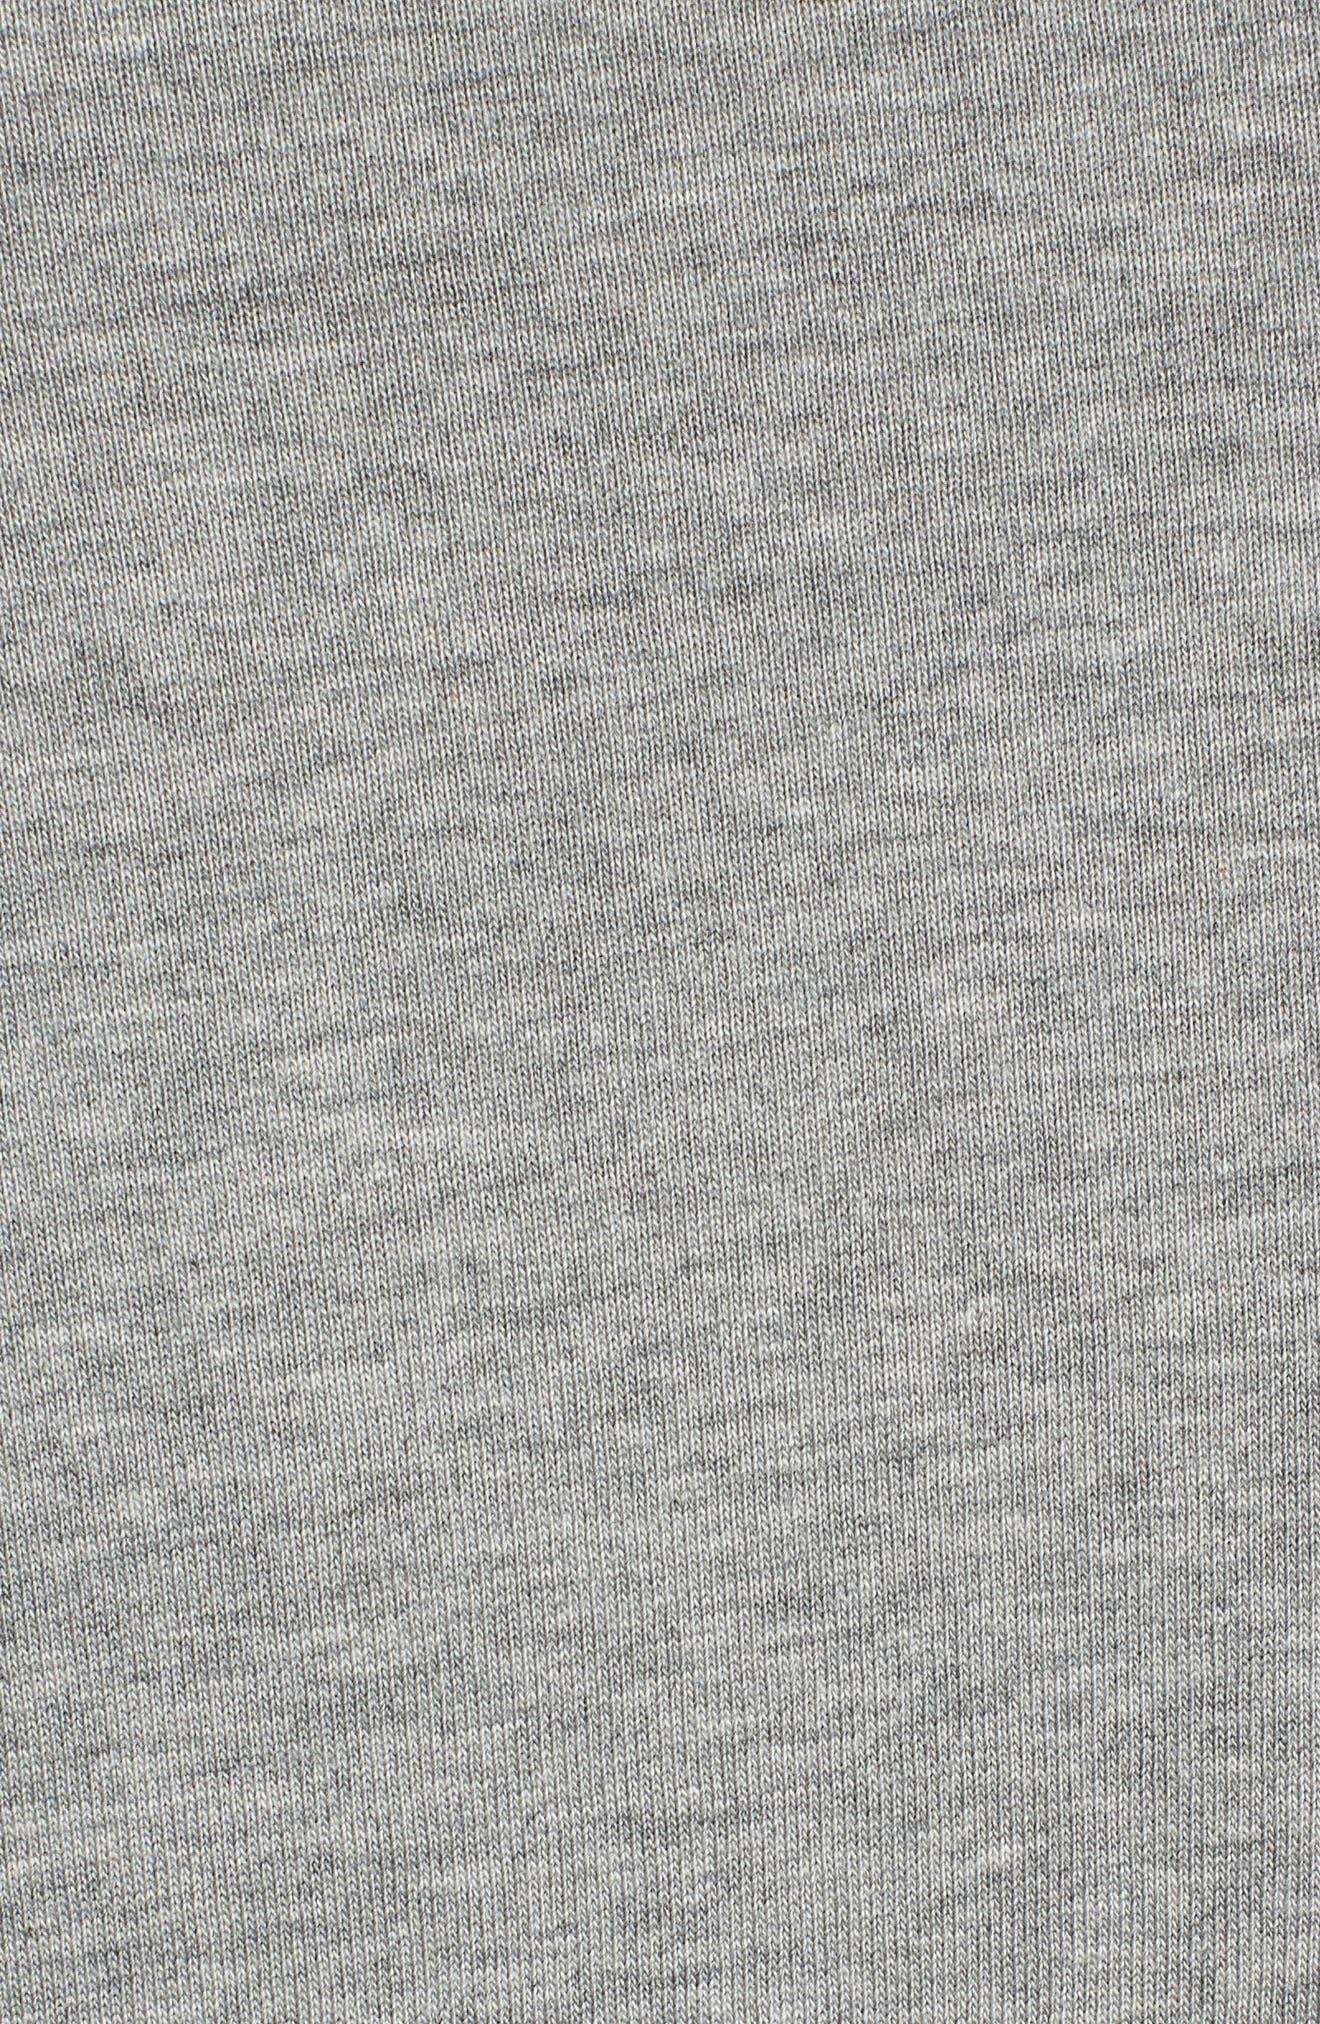 Windrunner Colorblocked T-Shirt,                             Alternate thumbnail 5, color,                             BLACK/ DK GREY HEATHER/ WHITE